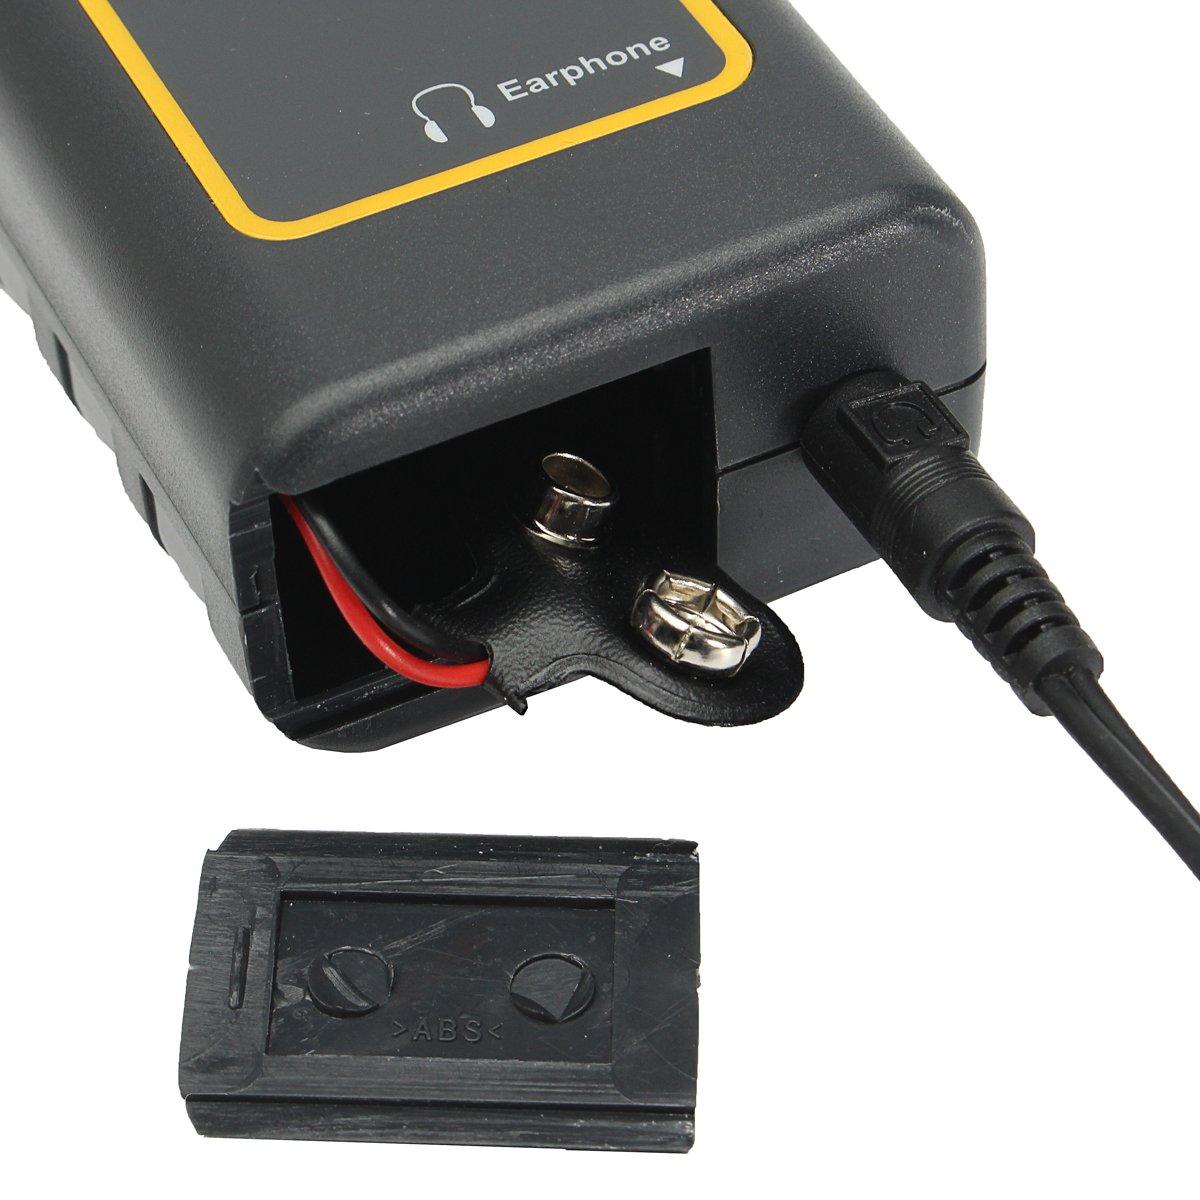 KUNSE Estetoscopio electrónico Auricular Detector de Fugas de Agua Tubo de detección Equipo Kit: Amazon.es: Hogar